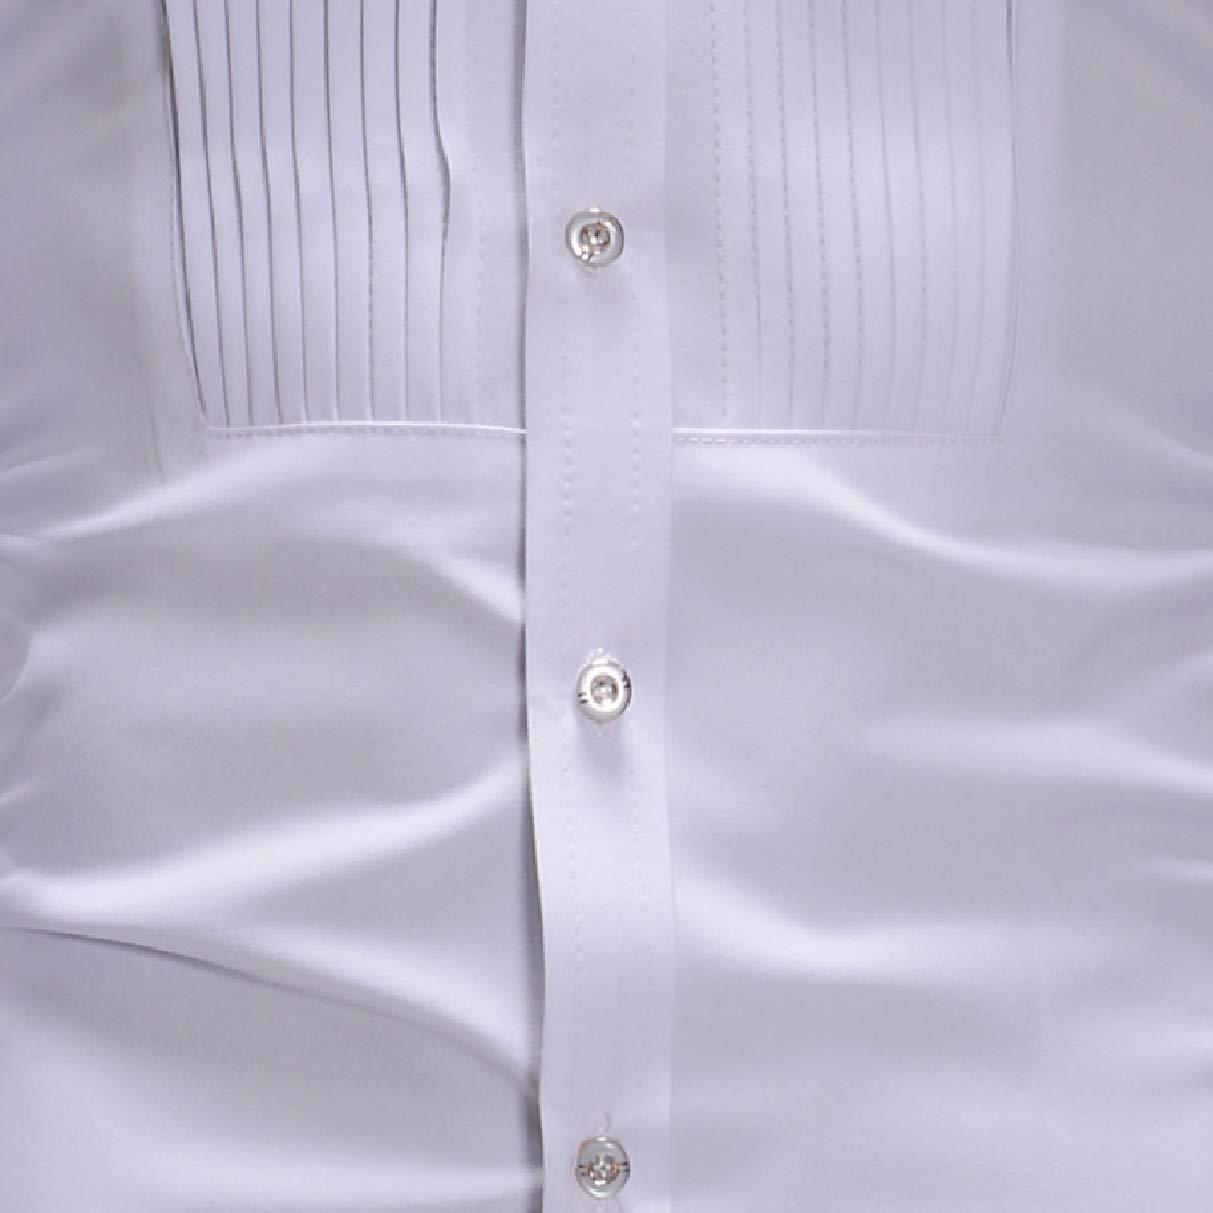 Fseason-Men Accordion Pleated Dress Stand Up Collar Slim Fit Shirt Tops